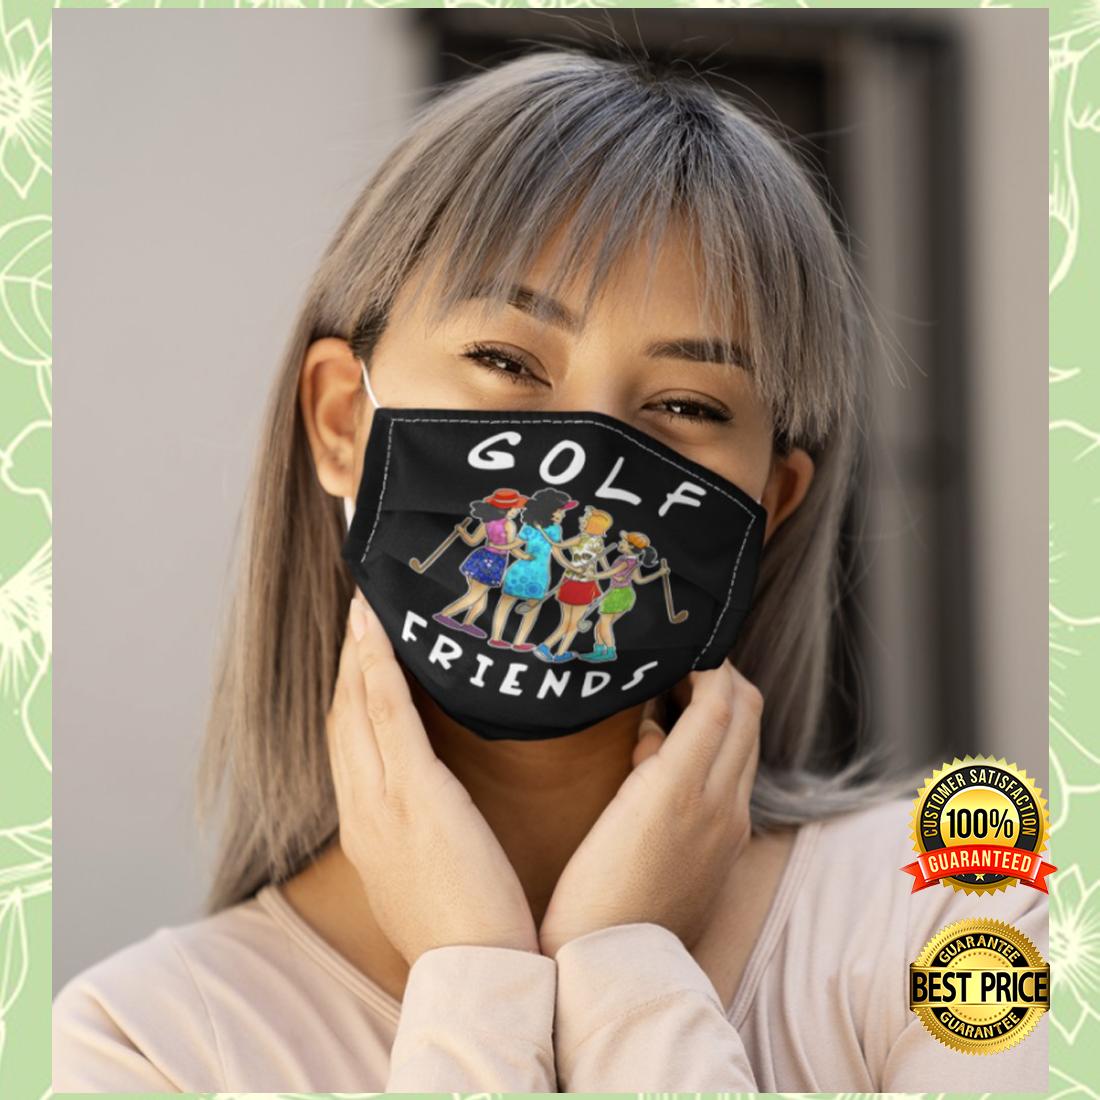 Golf friends cloth face mask 4